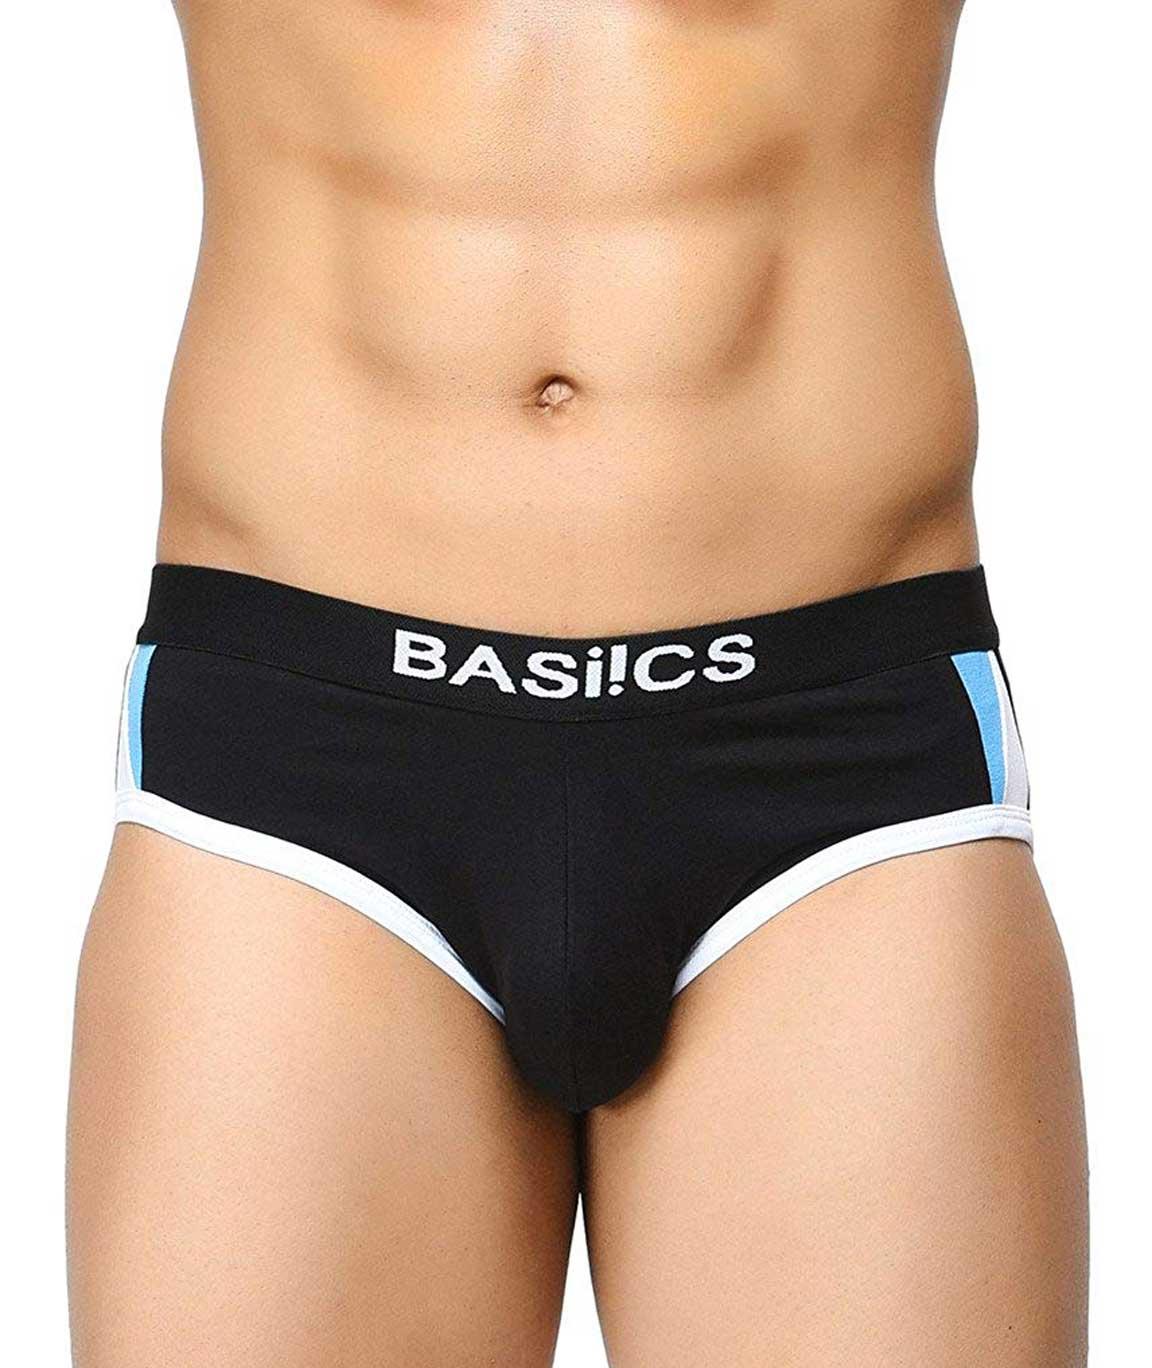 BASIICS by La Intimo Men`s Black Cotton Spandex Modern Pattern Brief